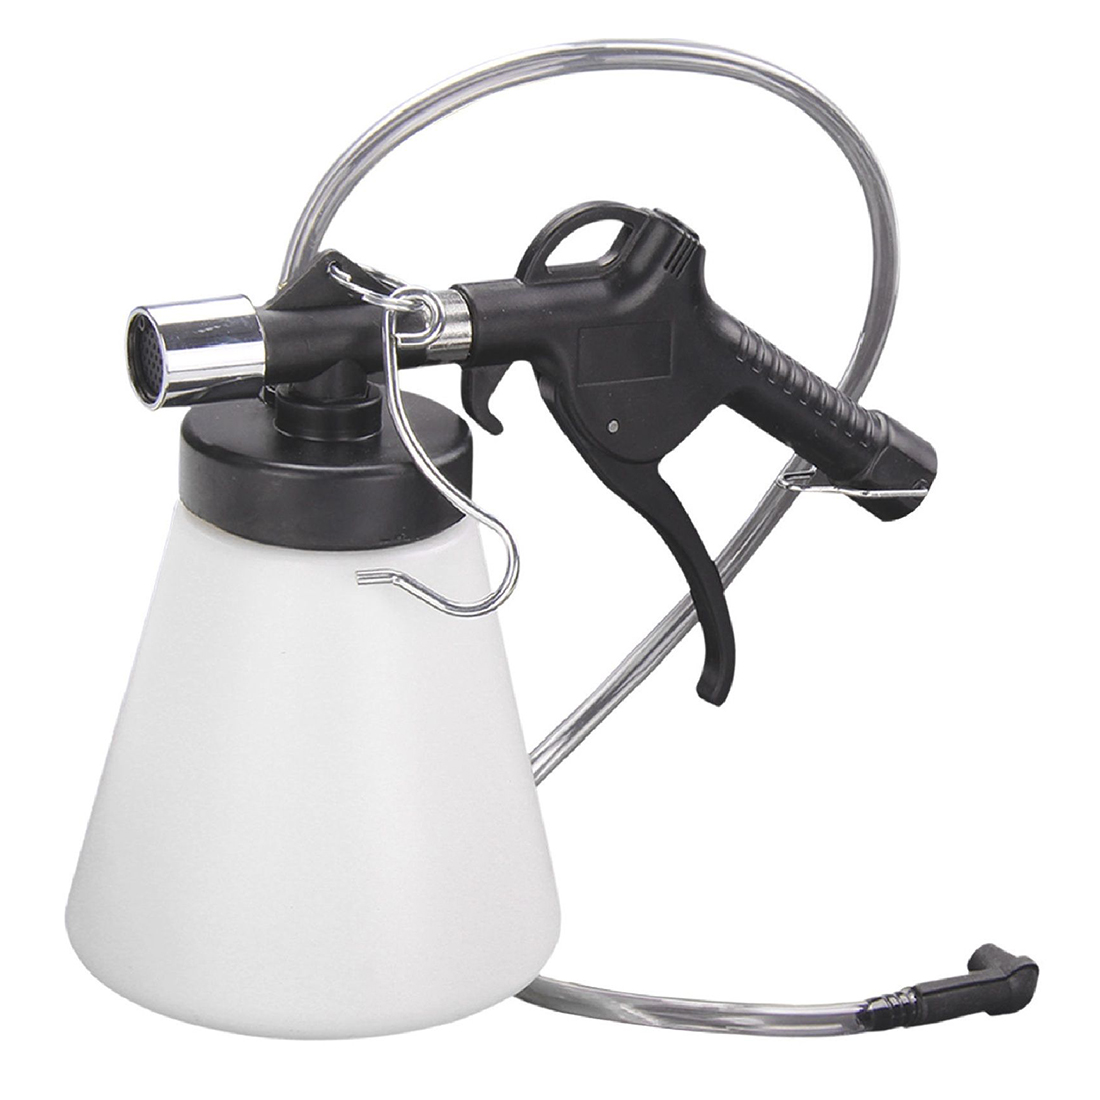 Promotion! Car Brake Clutch Bleeder Bleeding Fluid Kit Air Powered Pneumatic Vacuum Tool 1L